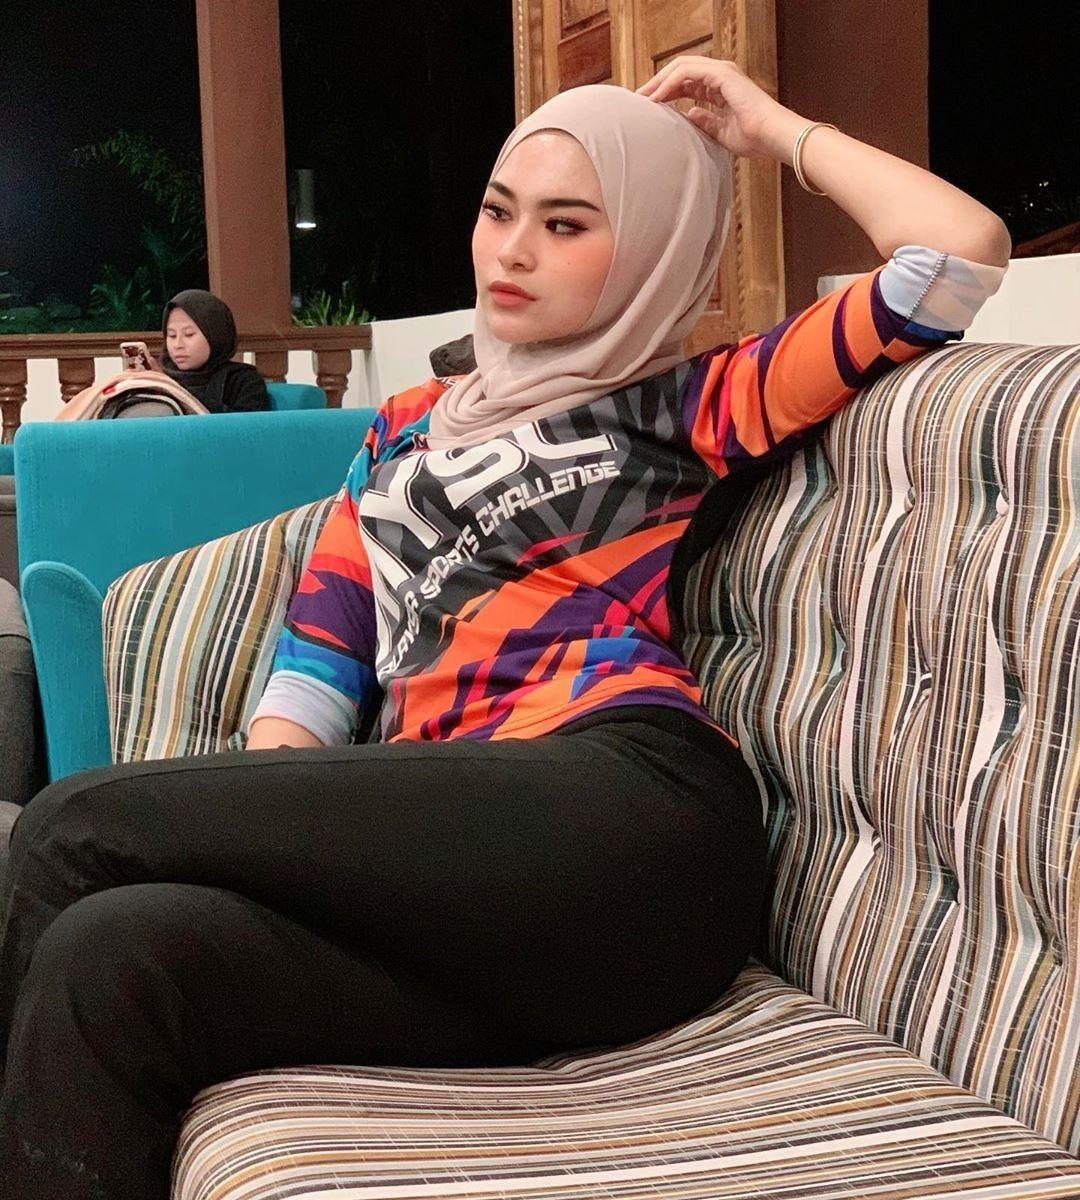 Hot Arab Sex Girl: Hot & Sexy Sunny Leone